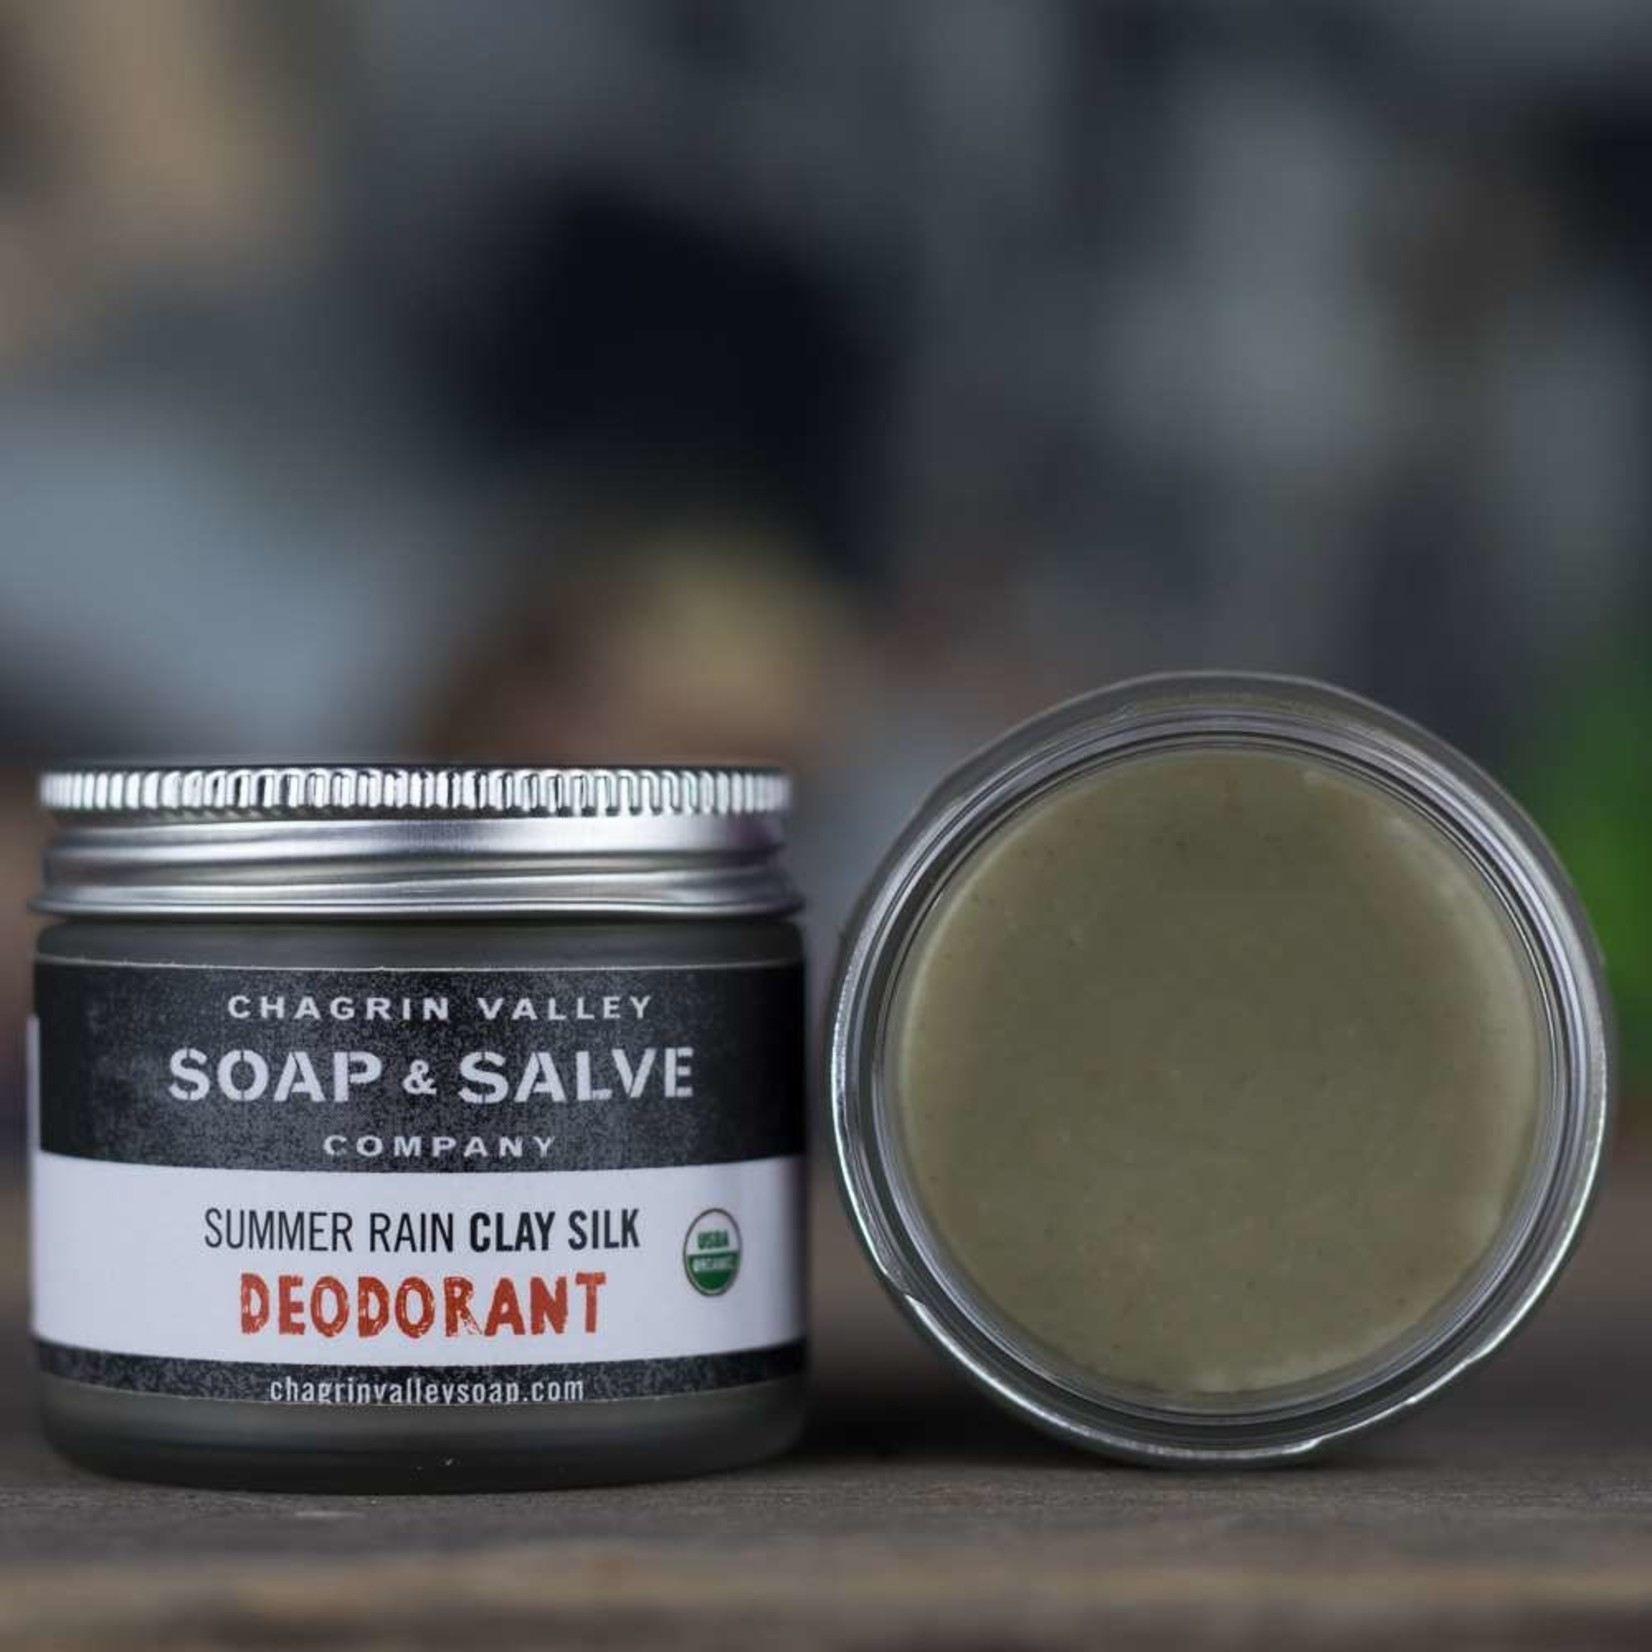 Chagrin Valley Soap and Salve Summer Rain Clay Silk Deodorant